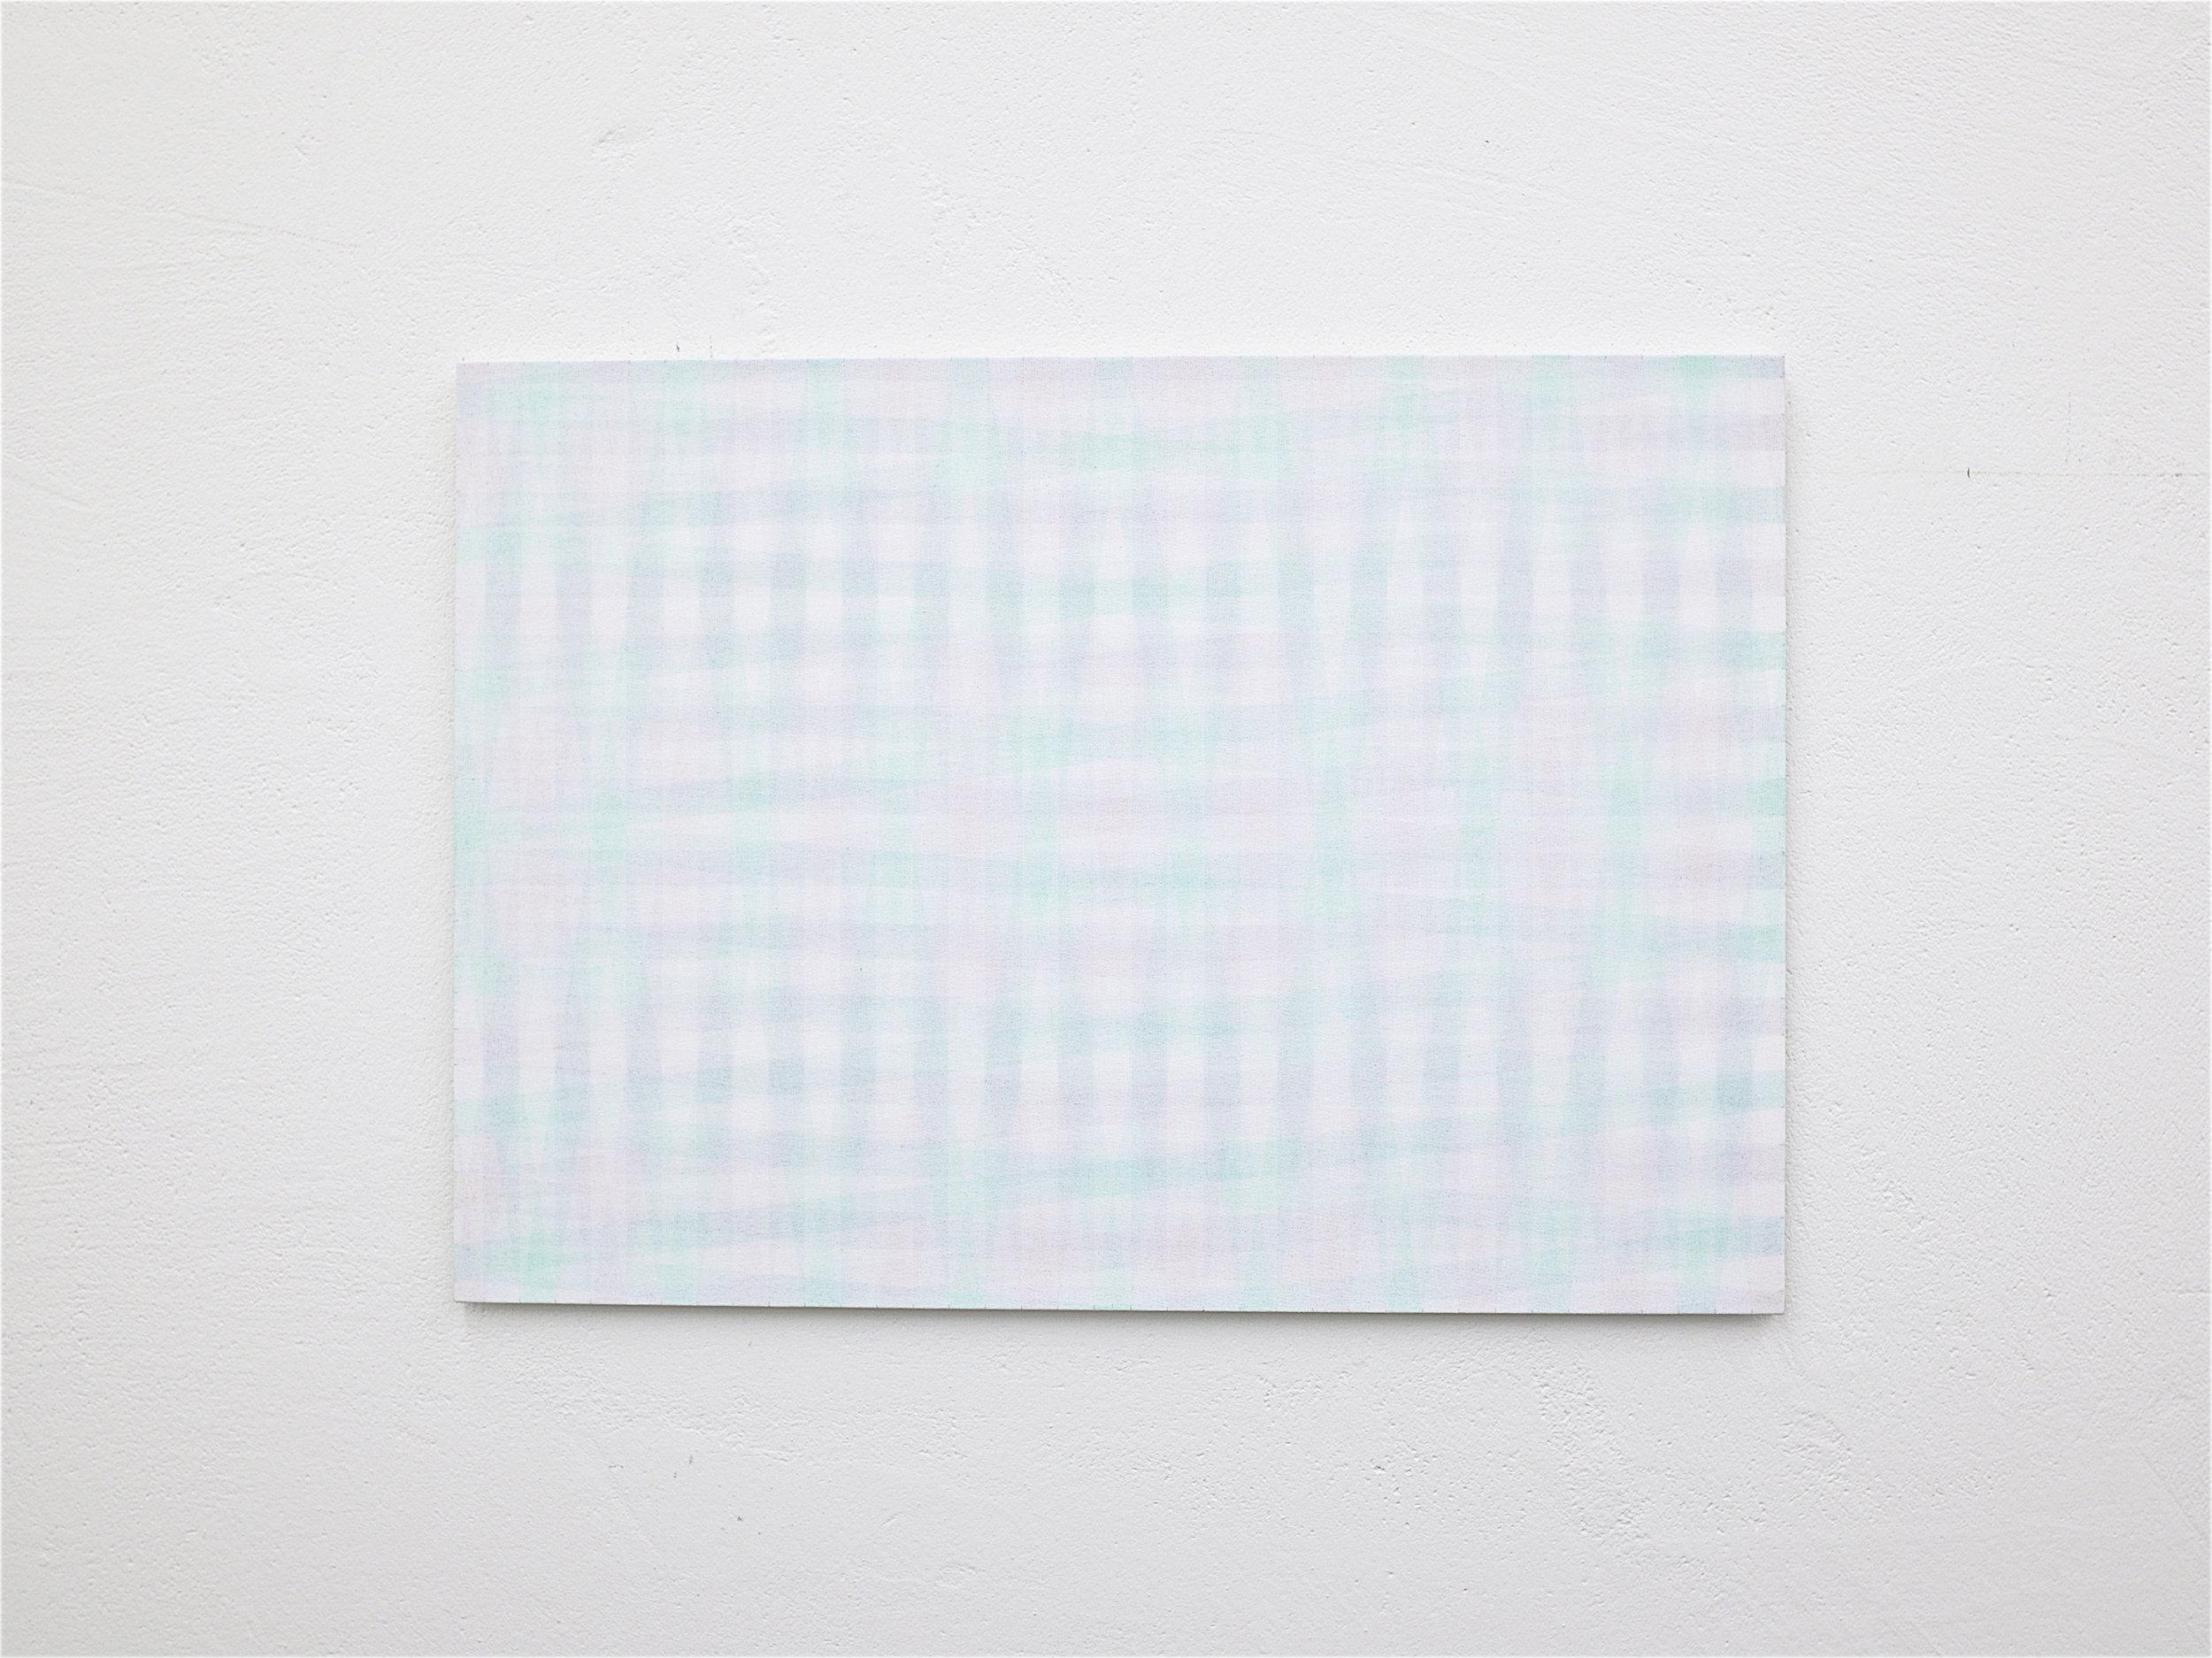 bild nr. 08/2016 - 50 x 70cm - acryl auf baumwolle/alu